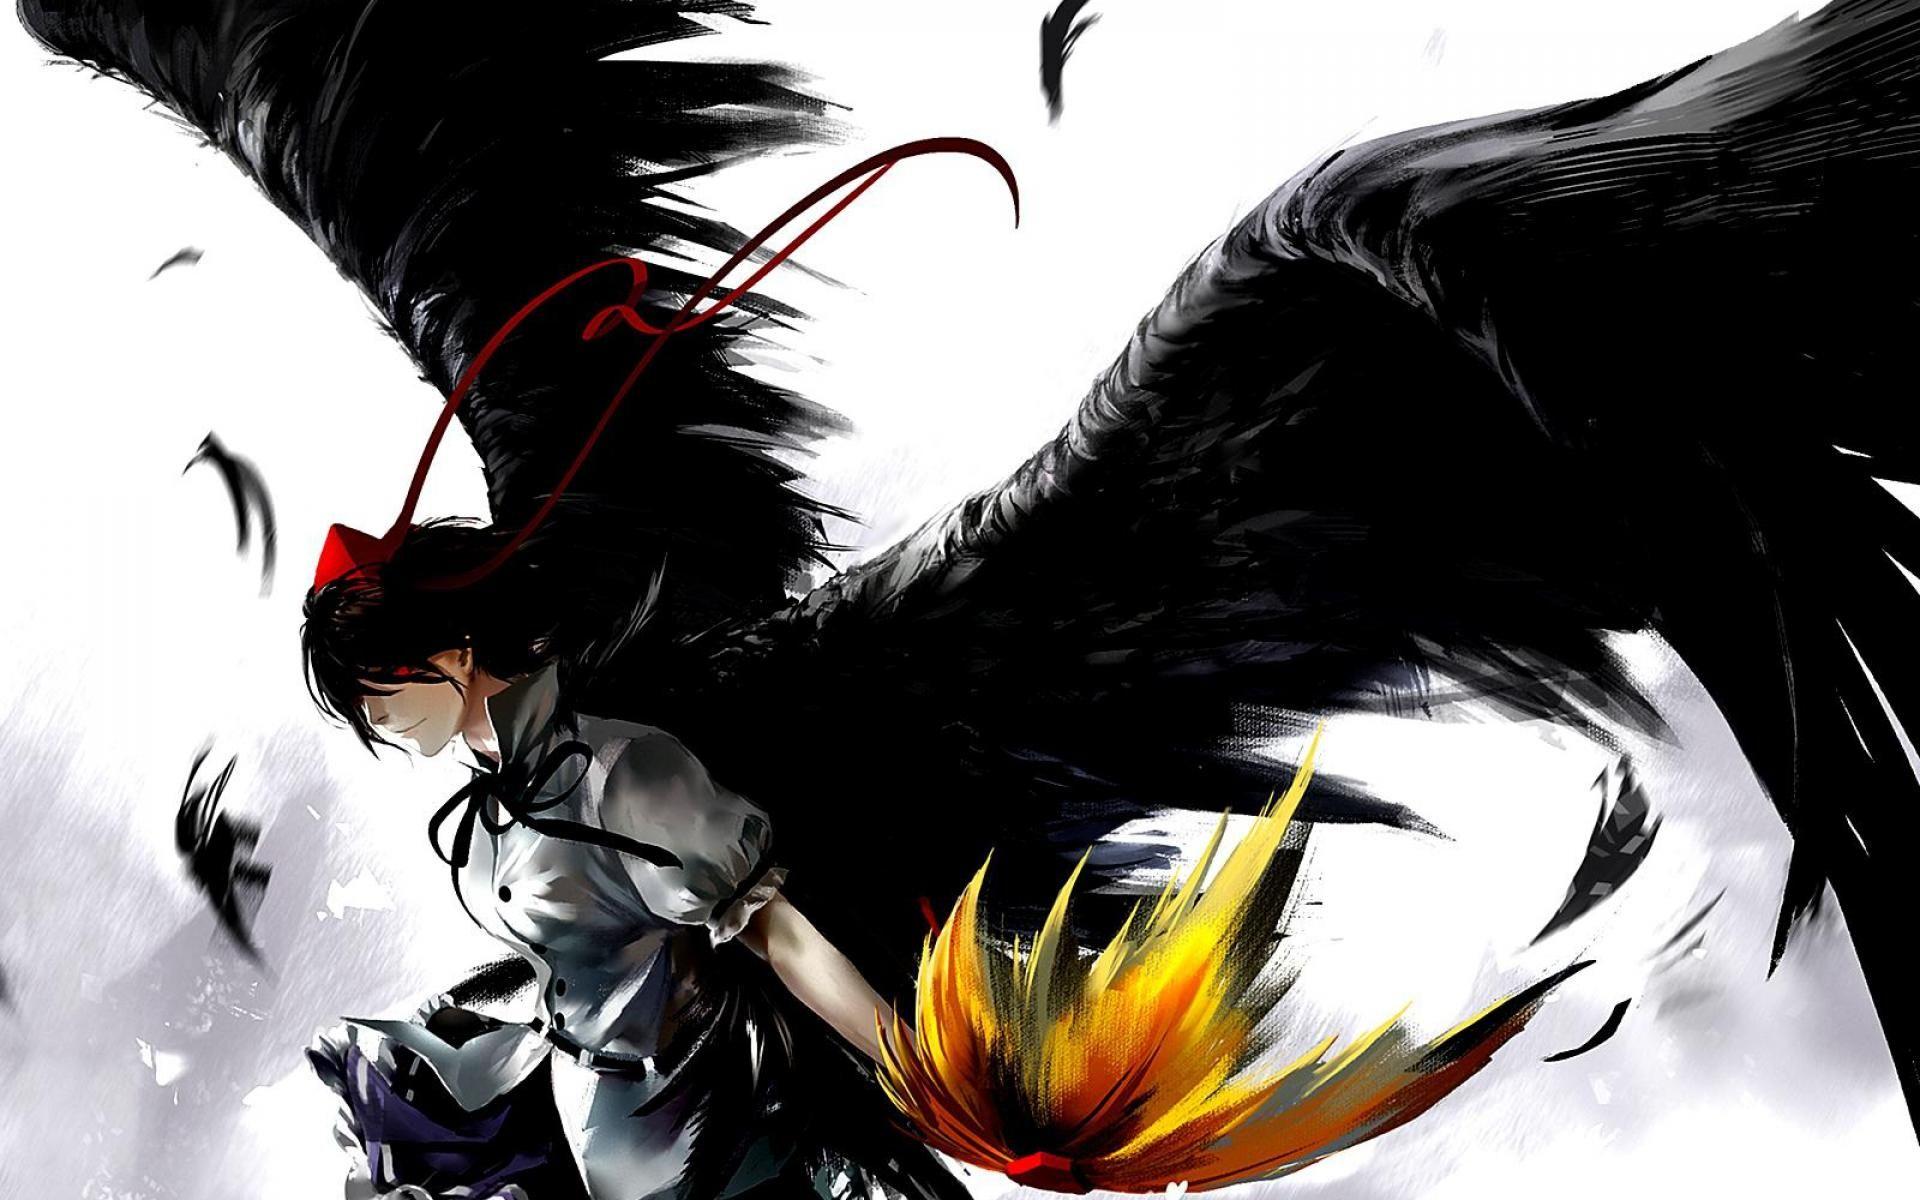 Anime dark angel wallpapers dark art dark angel - Dark angel anime wallpaper ...